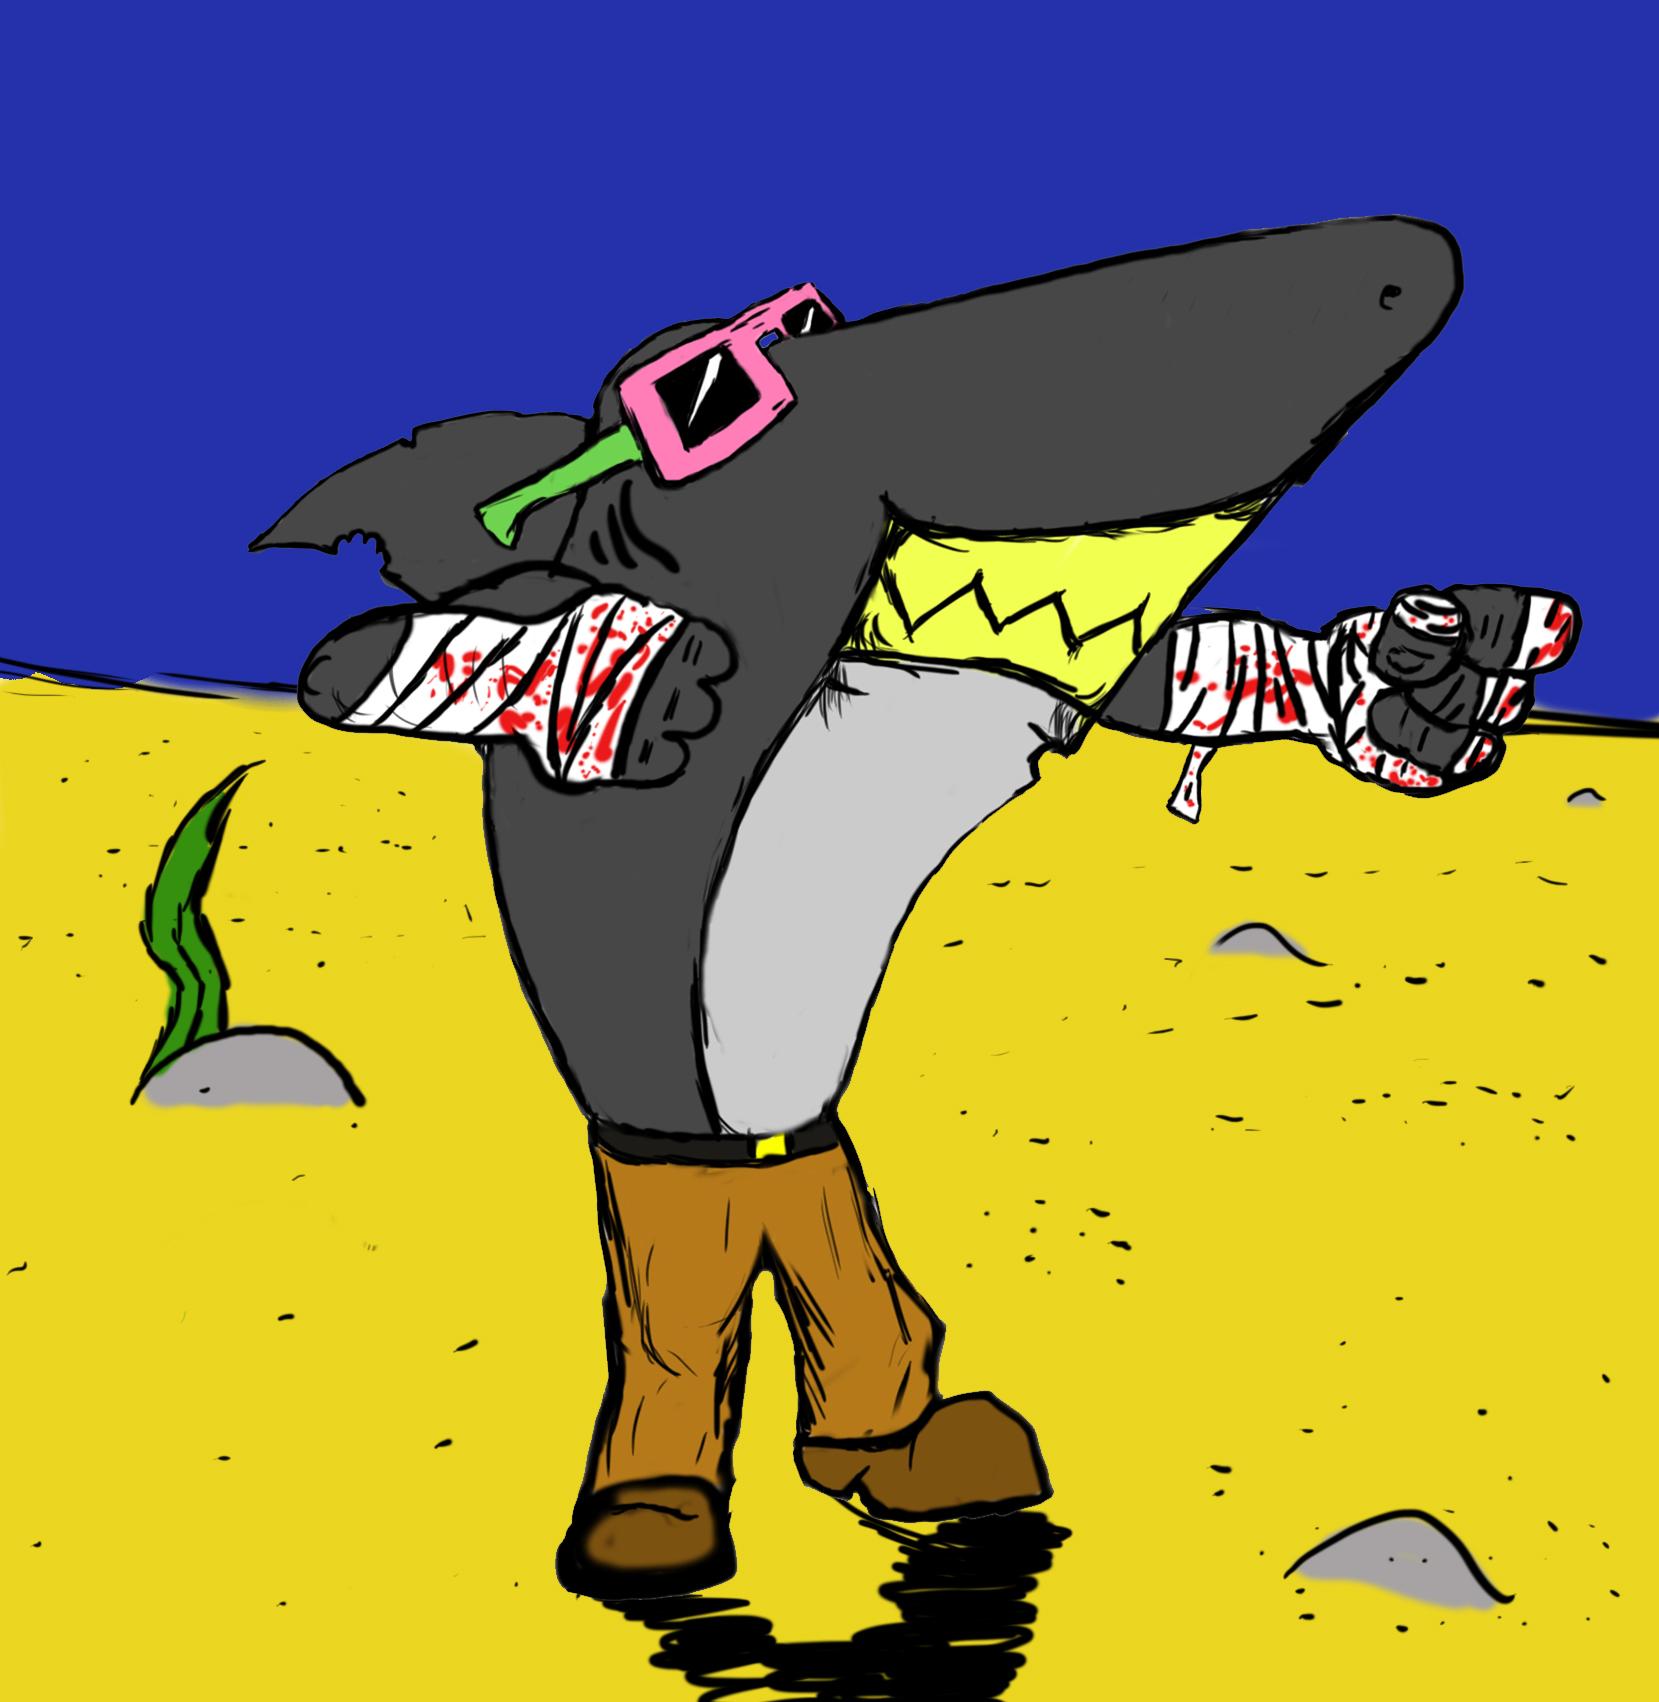 Sharkpunch